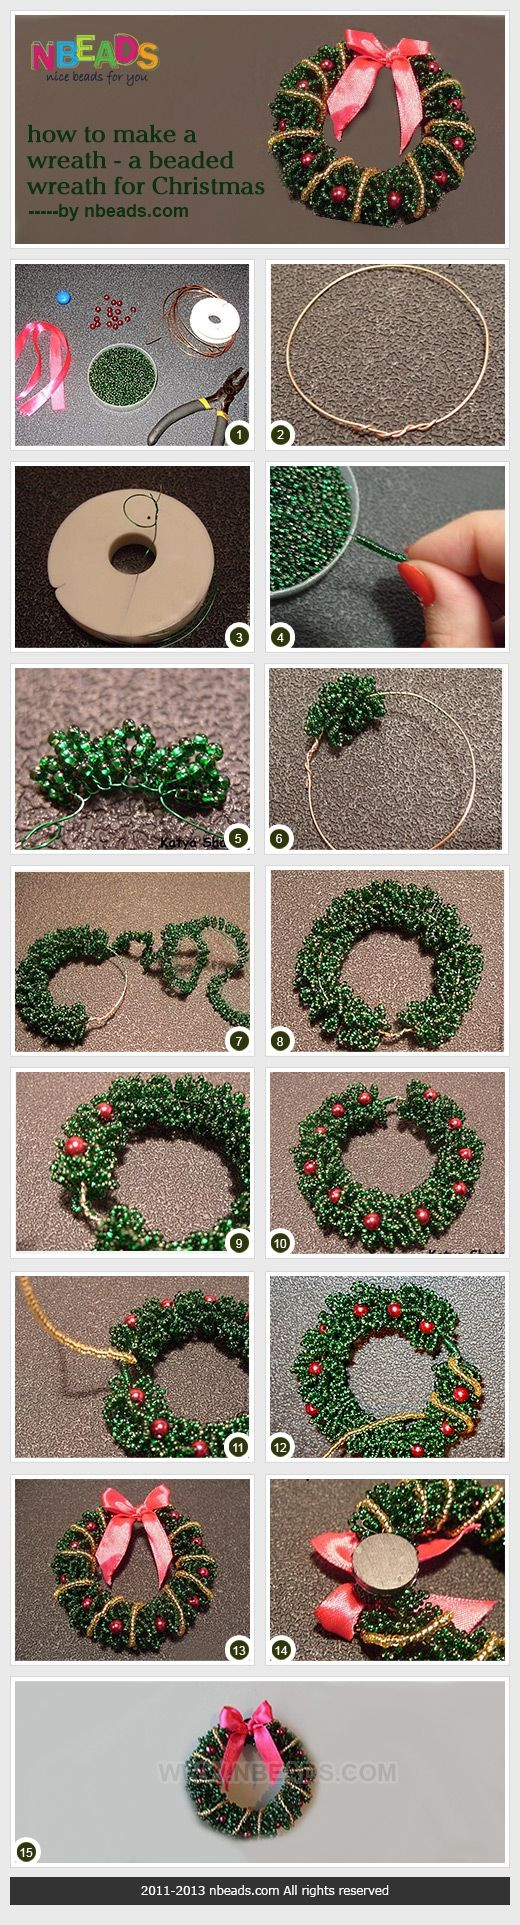 How to Make A Wreath - A Beaded Wreath for Christmas – Nbeads